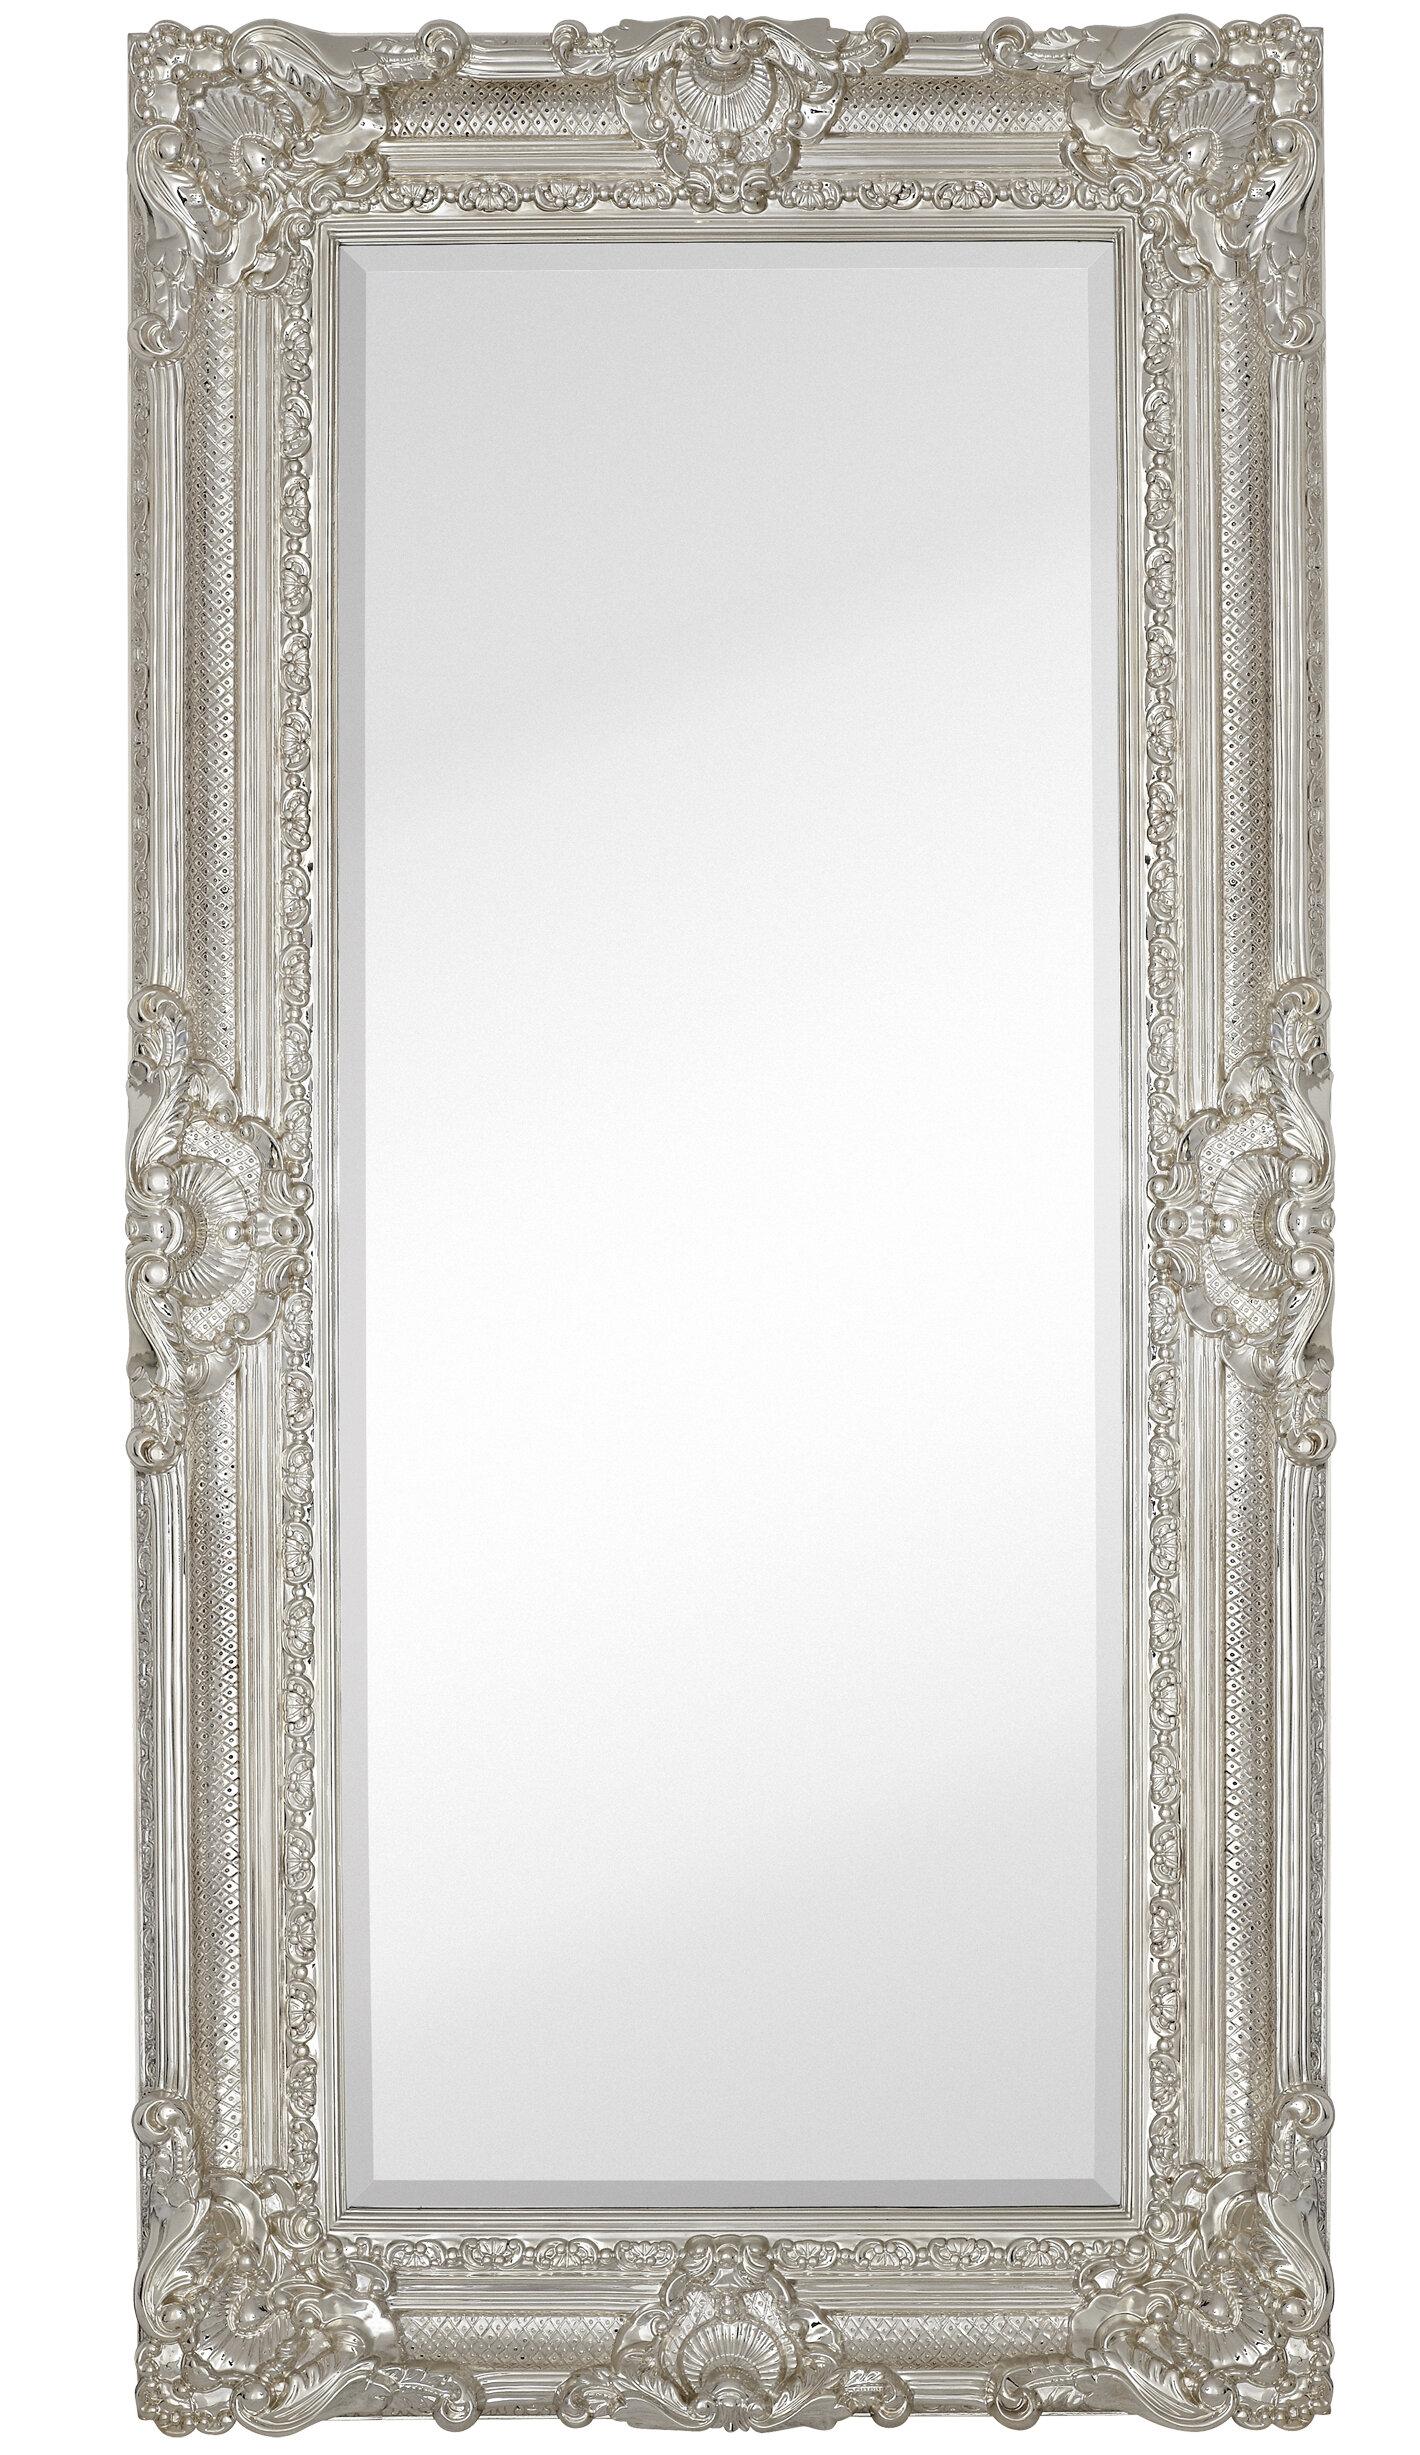 Majestic Mirror Large Traditional Polished Chrome Rectangular Beveled Gl Framed Wall Wayfair